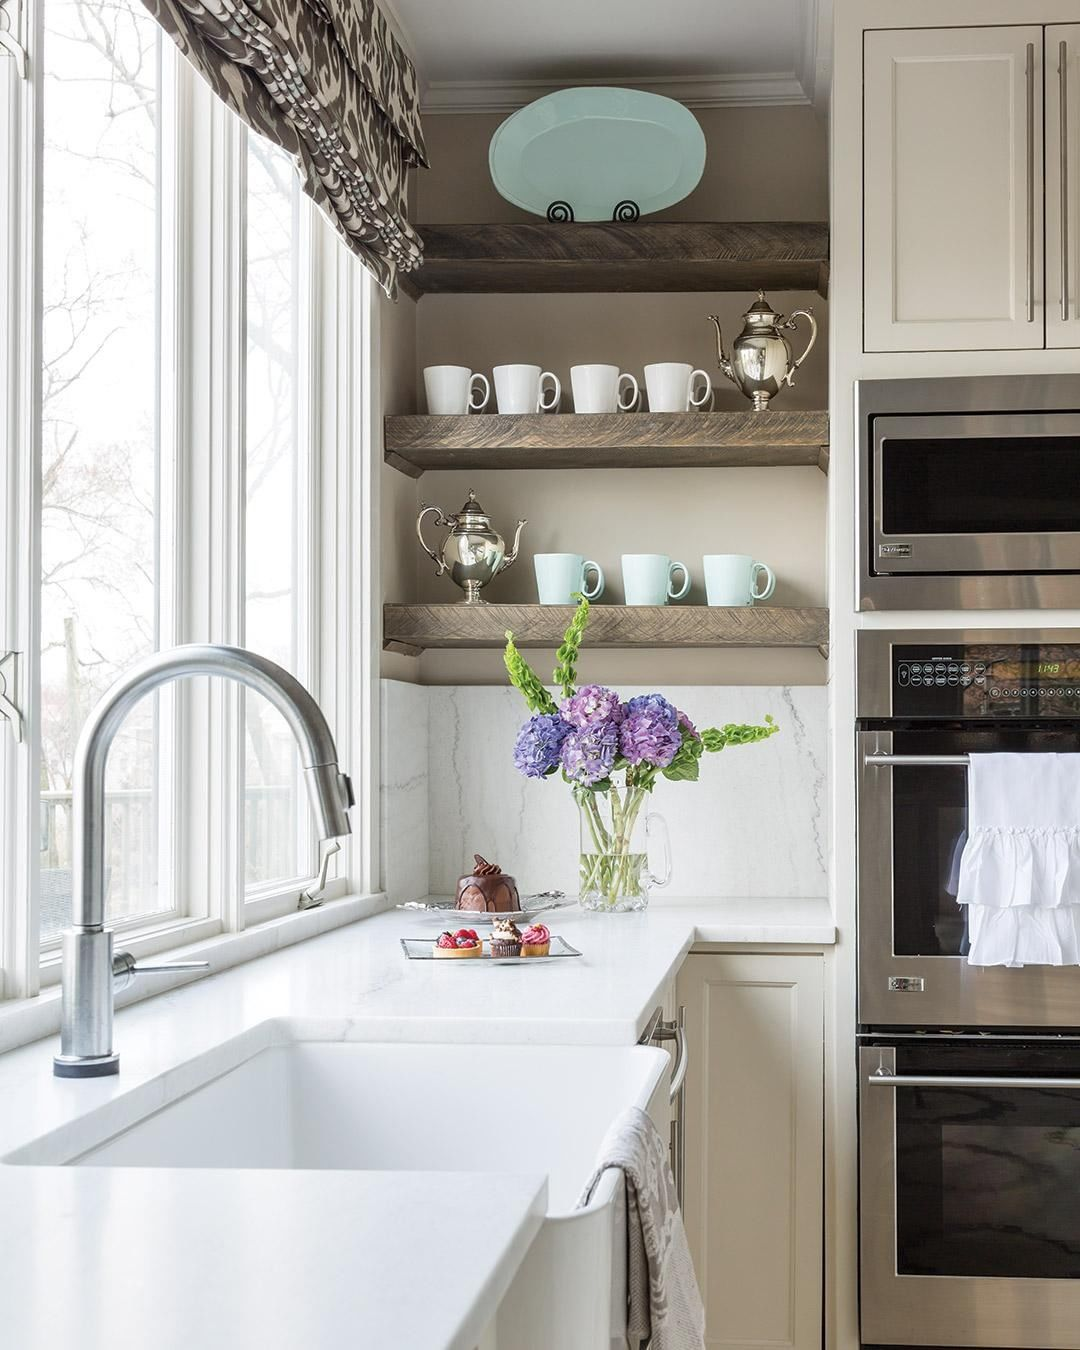 Kitchen closet decor ideas; Kitchen decor apartment; modern Kitchen decor ideas on a budget; Kitchen decor